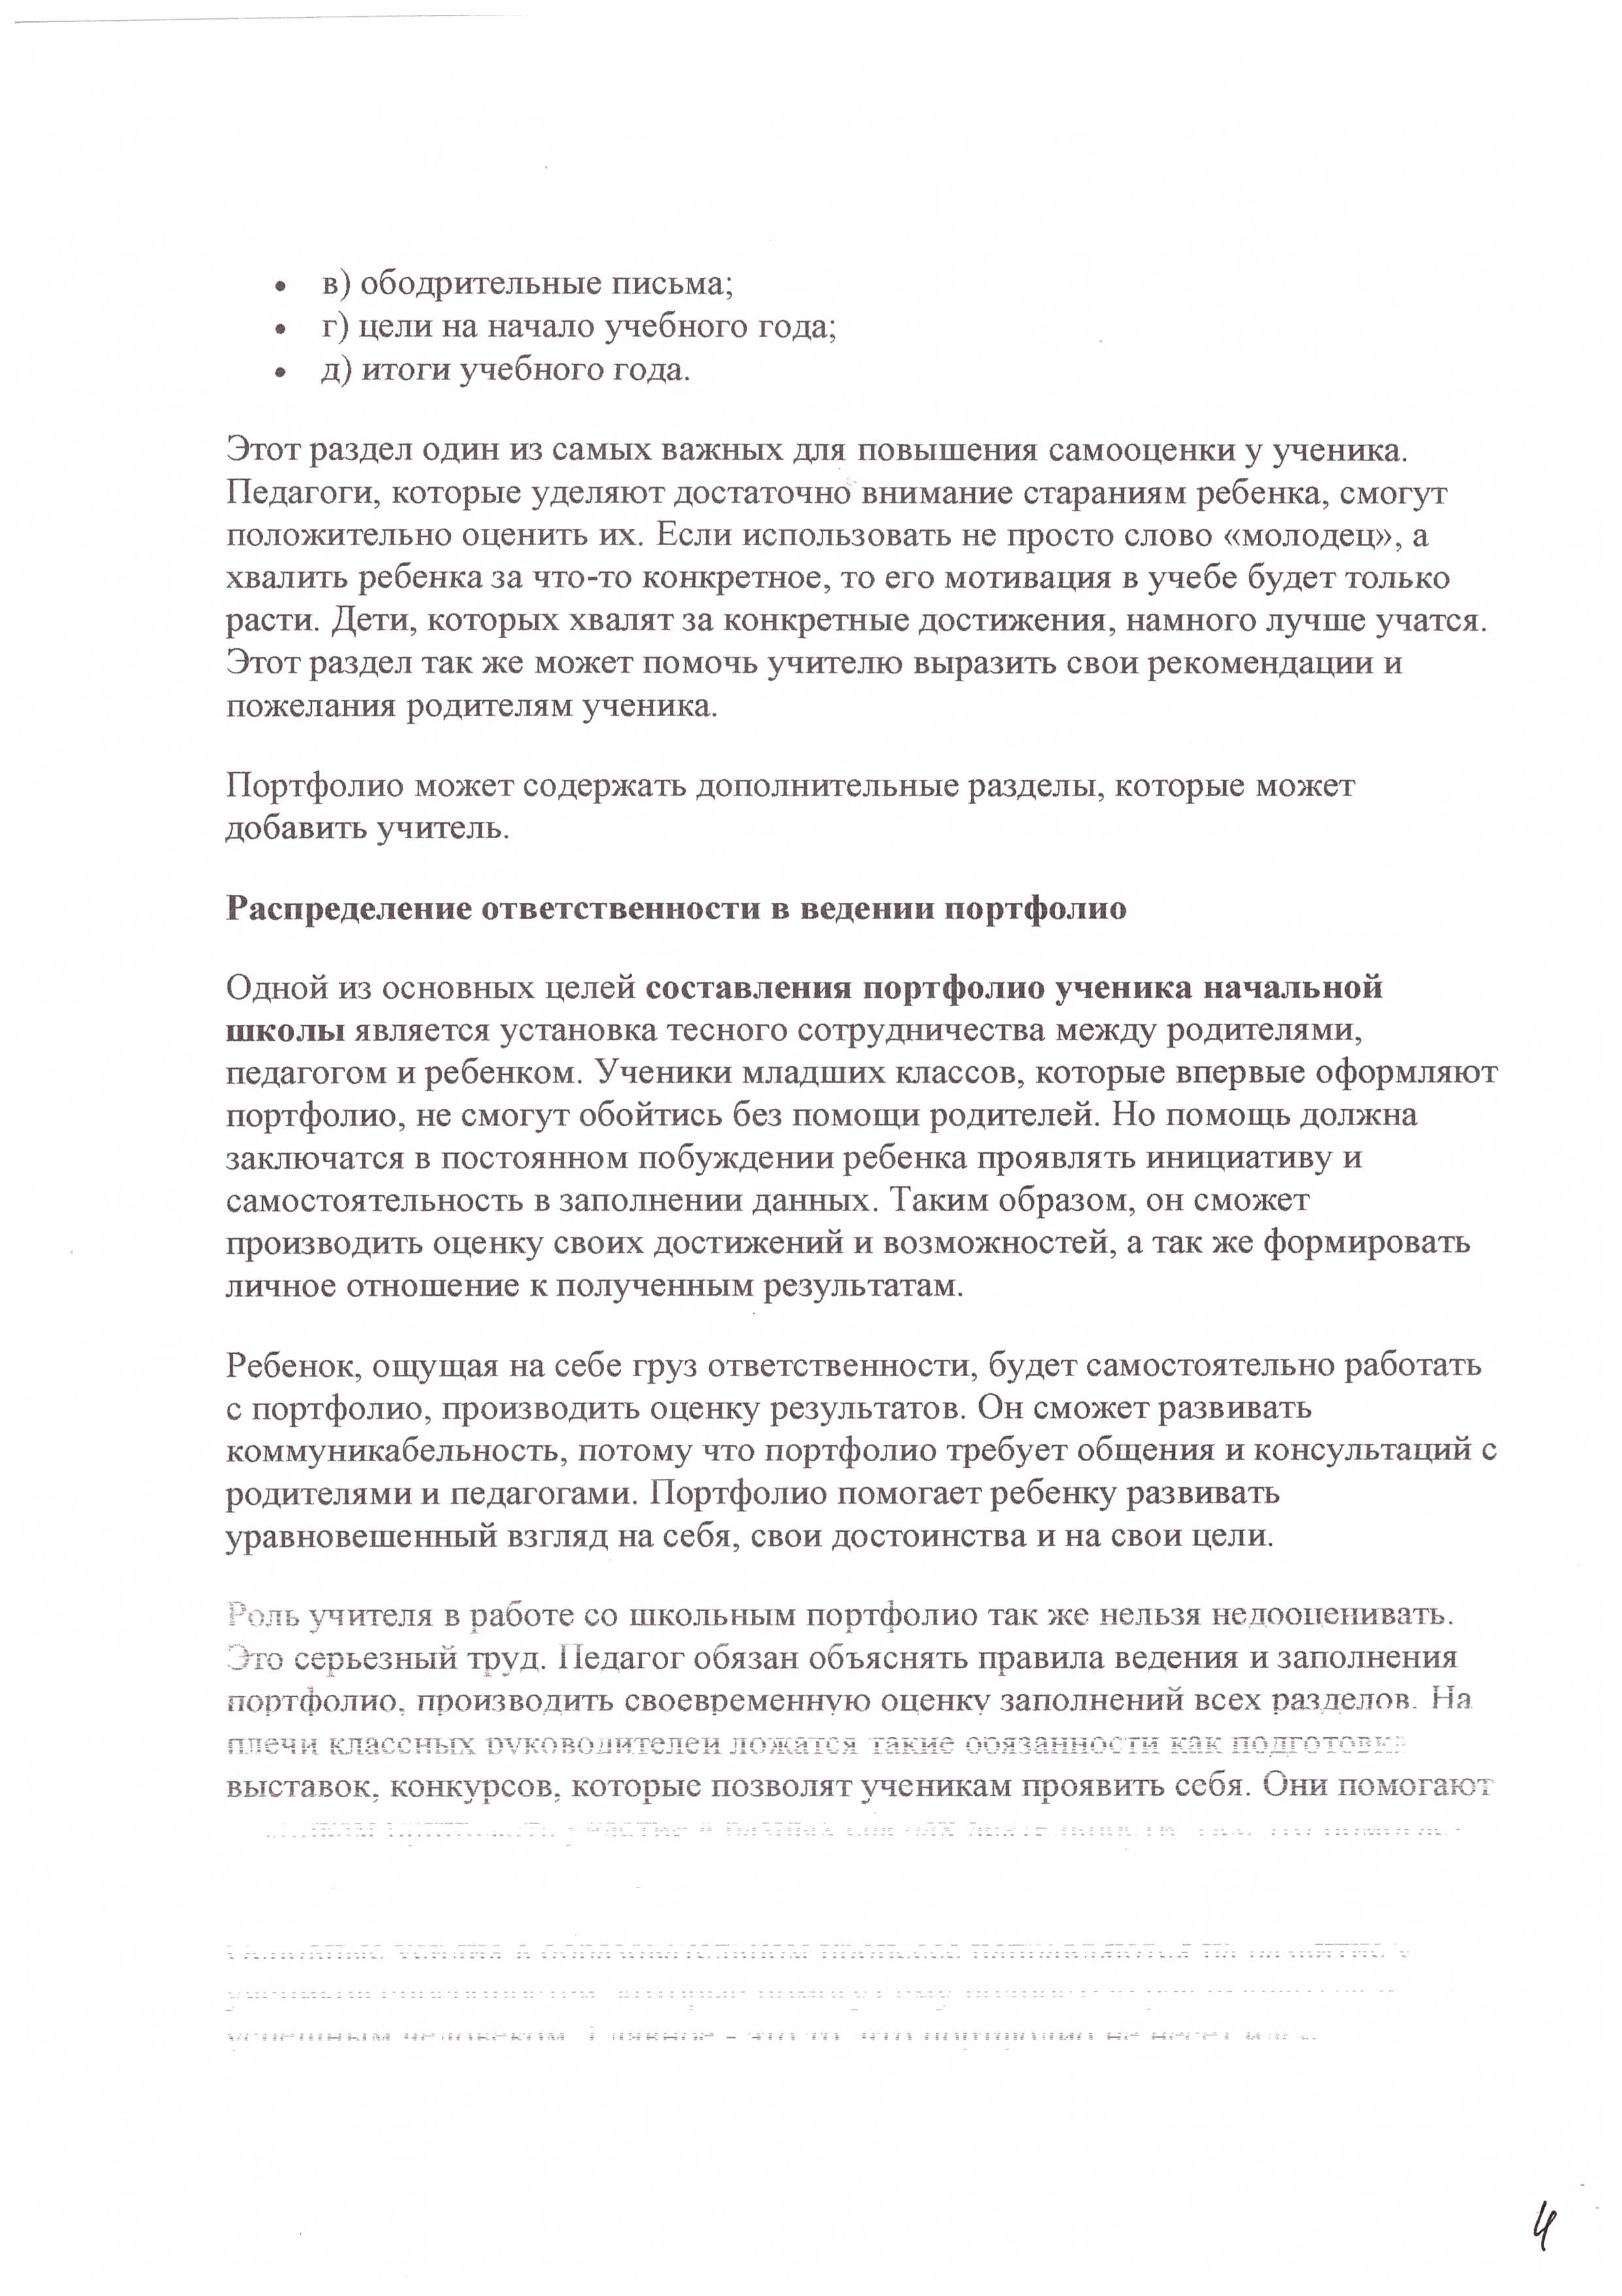 C:\Documents and Settings\Админ\Мои документы\стр.4..jpeg